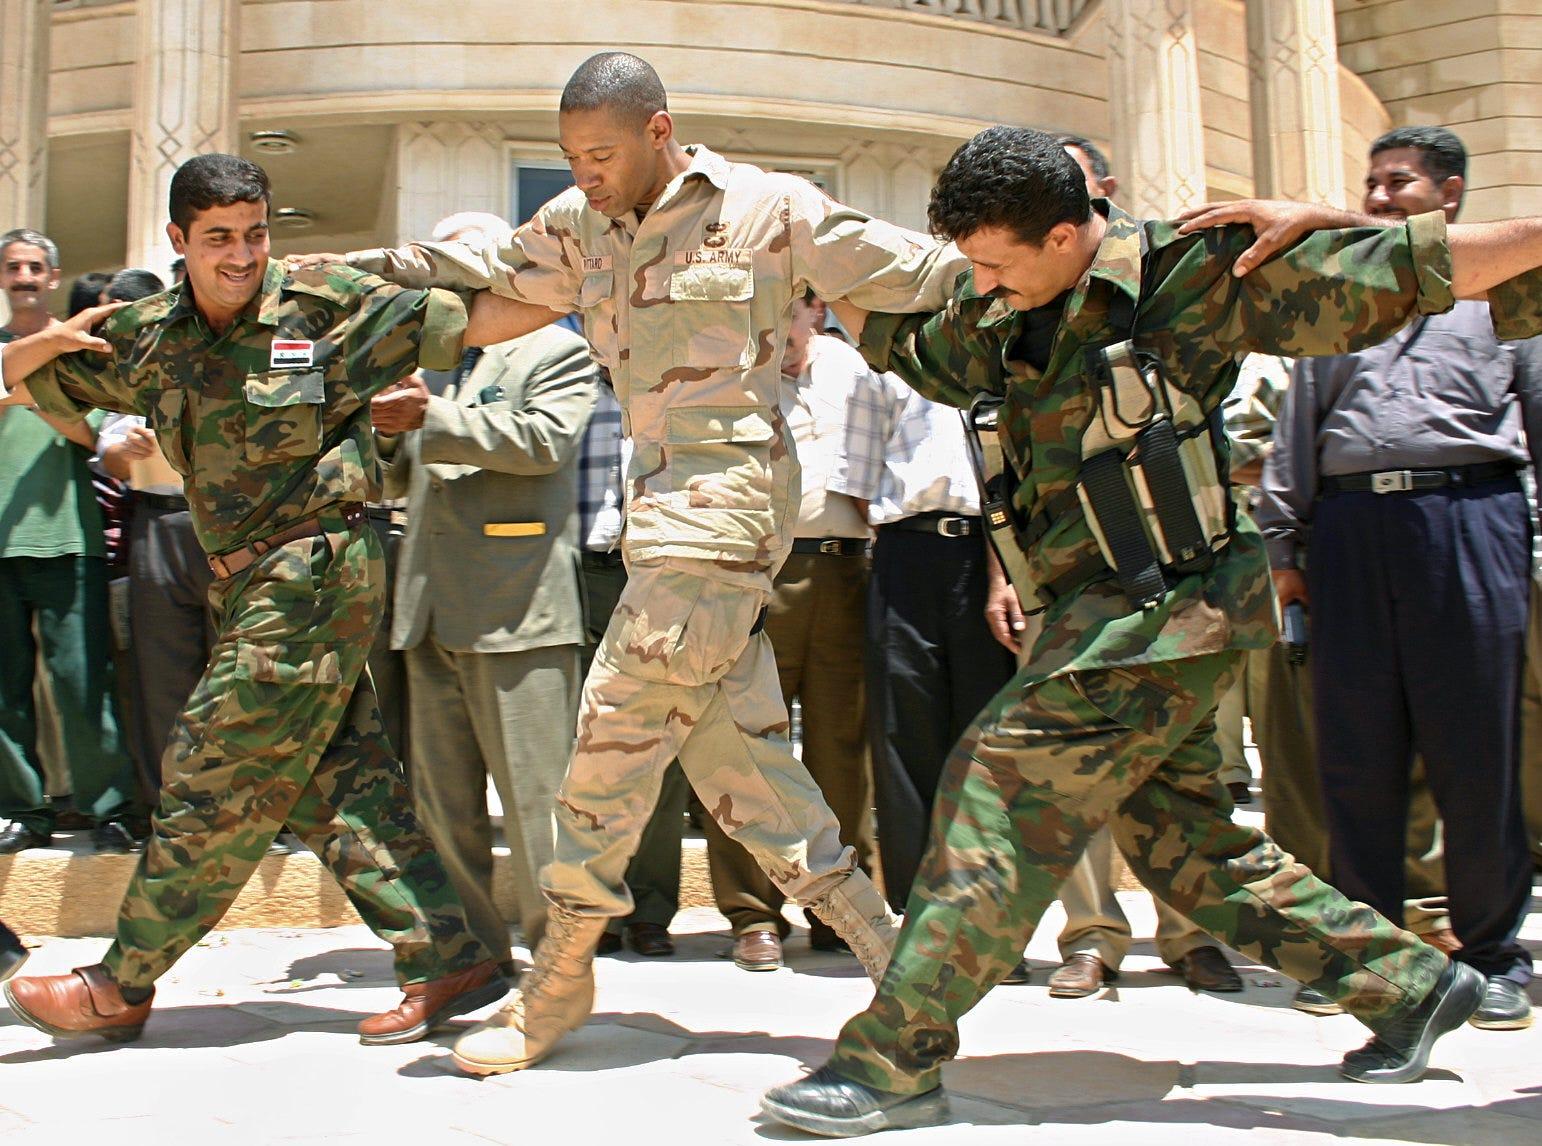 Dana Pittard dances with Iraqi national guardsmen during an Iraqi flag-raising ceremony in Baquba, northeast of Baghdad, on July 6, 2004.